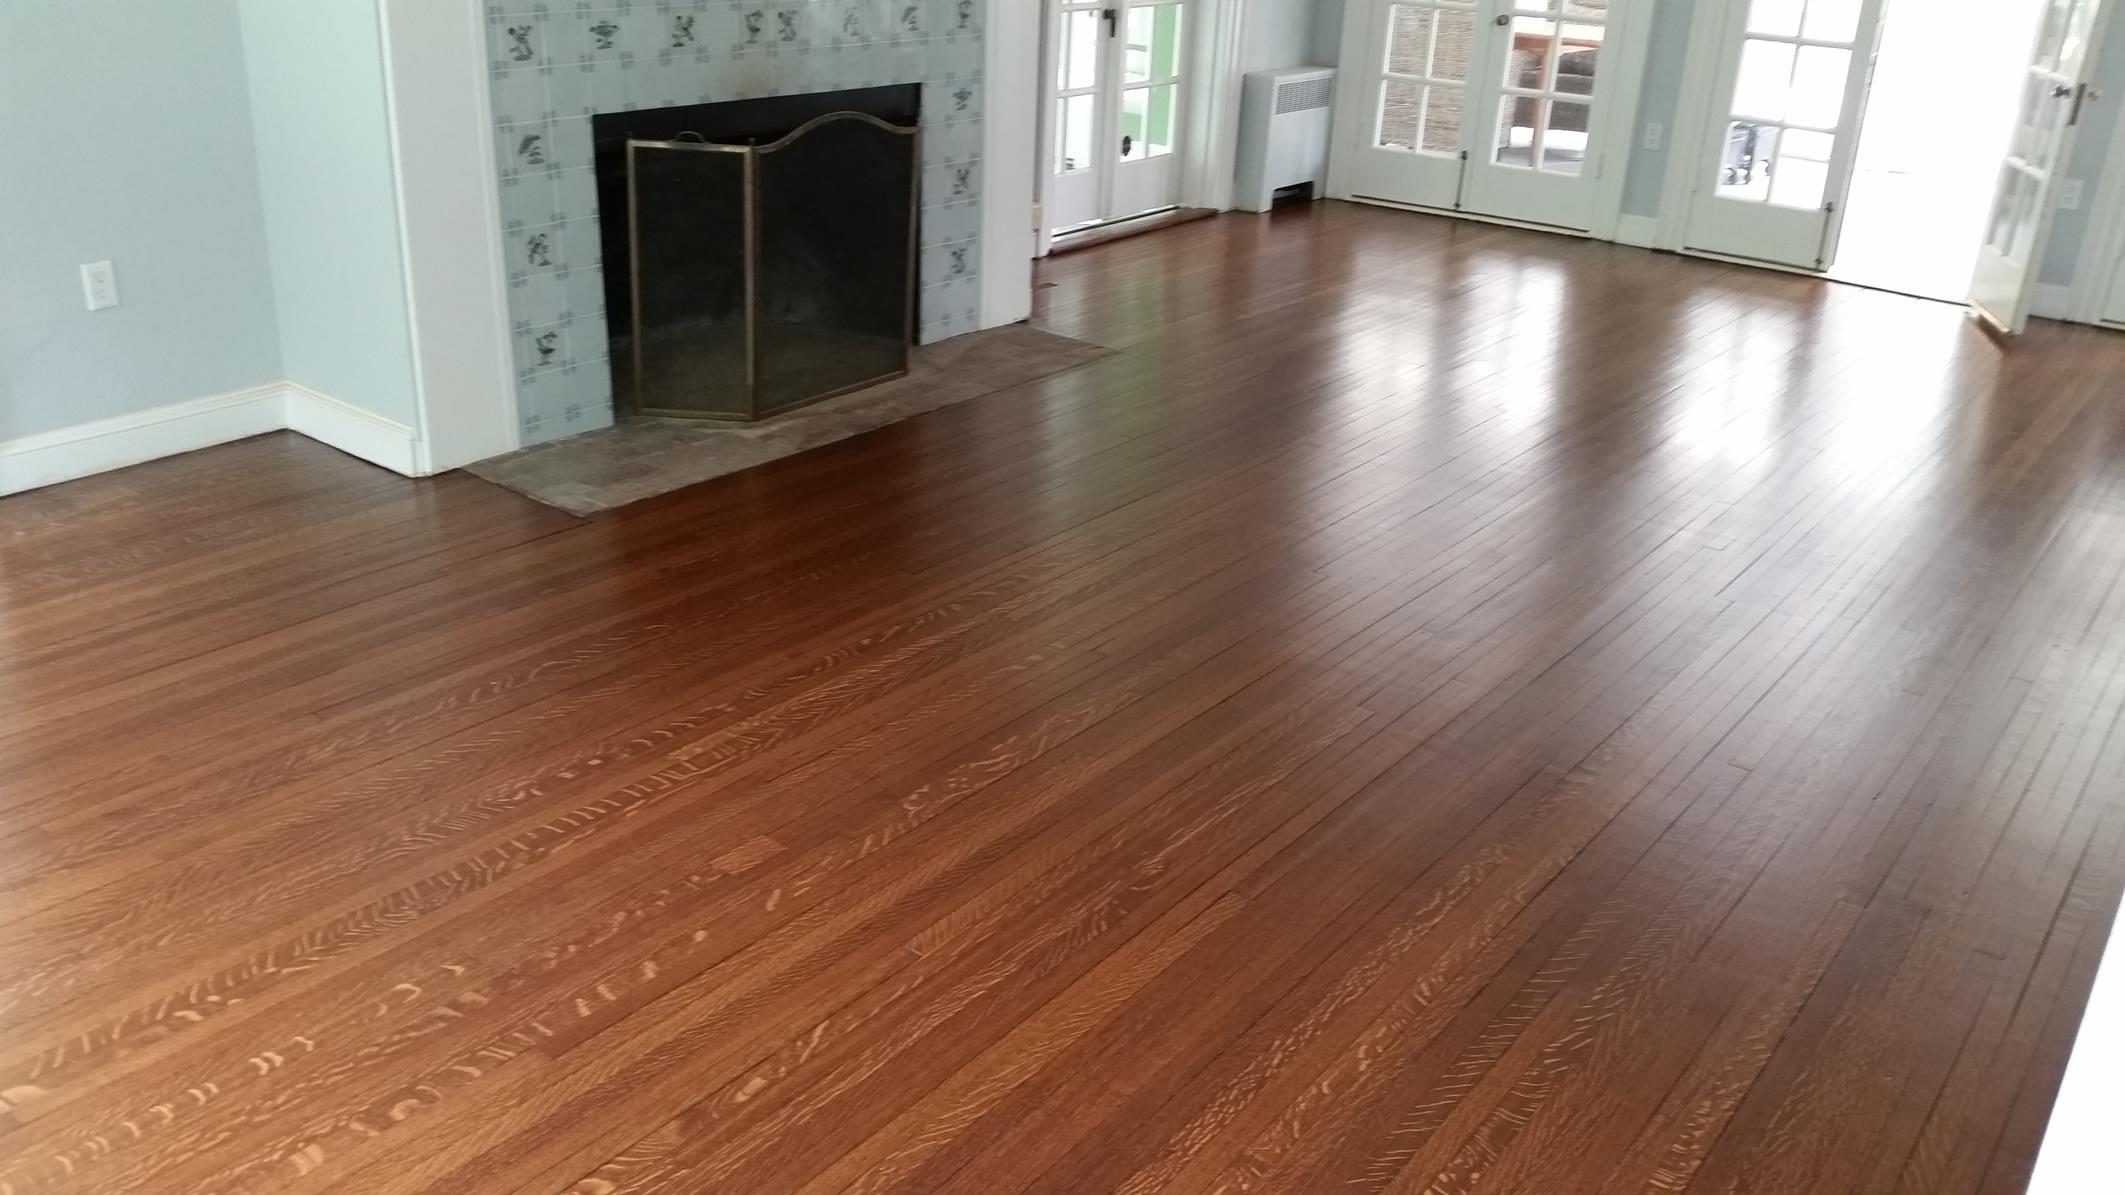 Hardwood Flooring Installation And Refinishing In Malvern